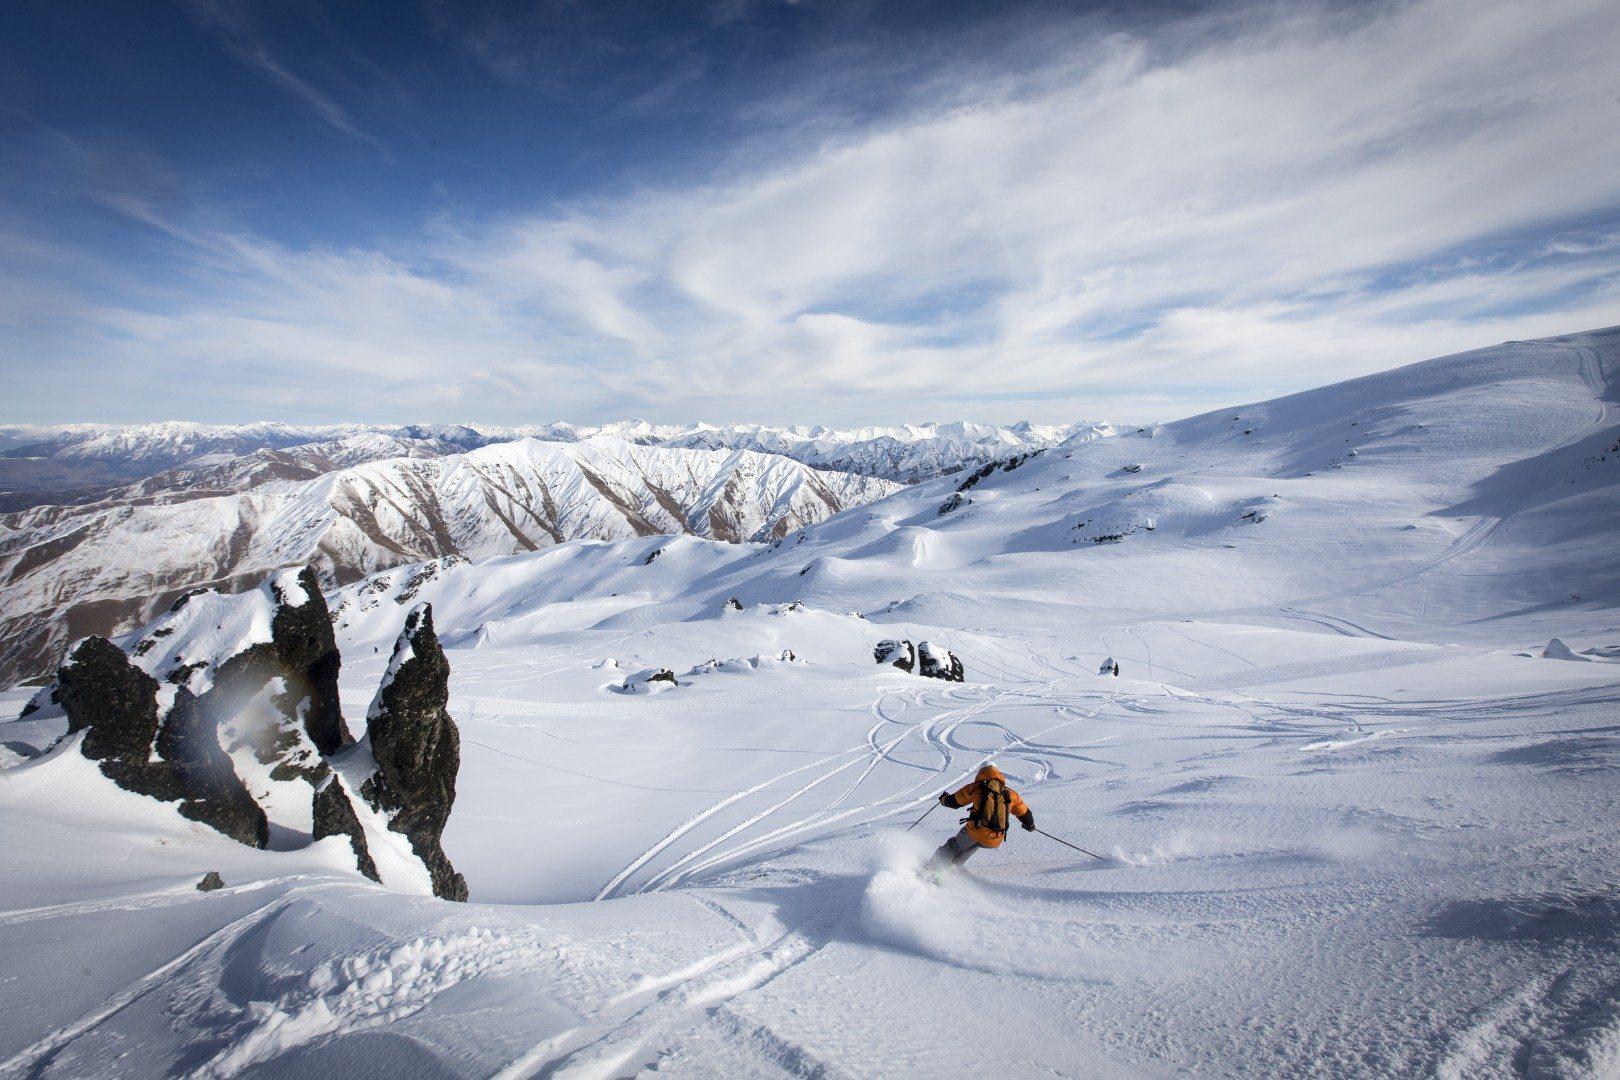 MajorDomo Villas - Soho Skiing - Making tracks